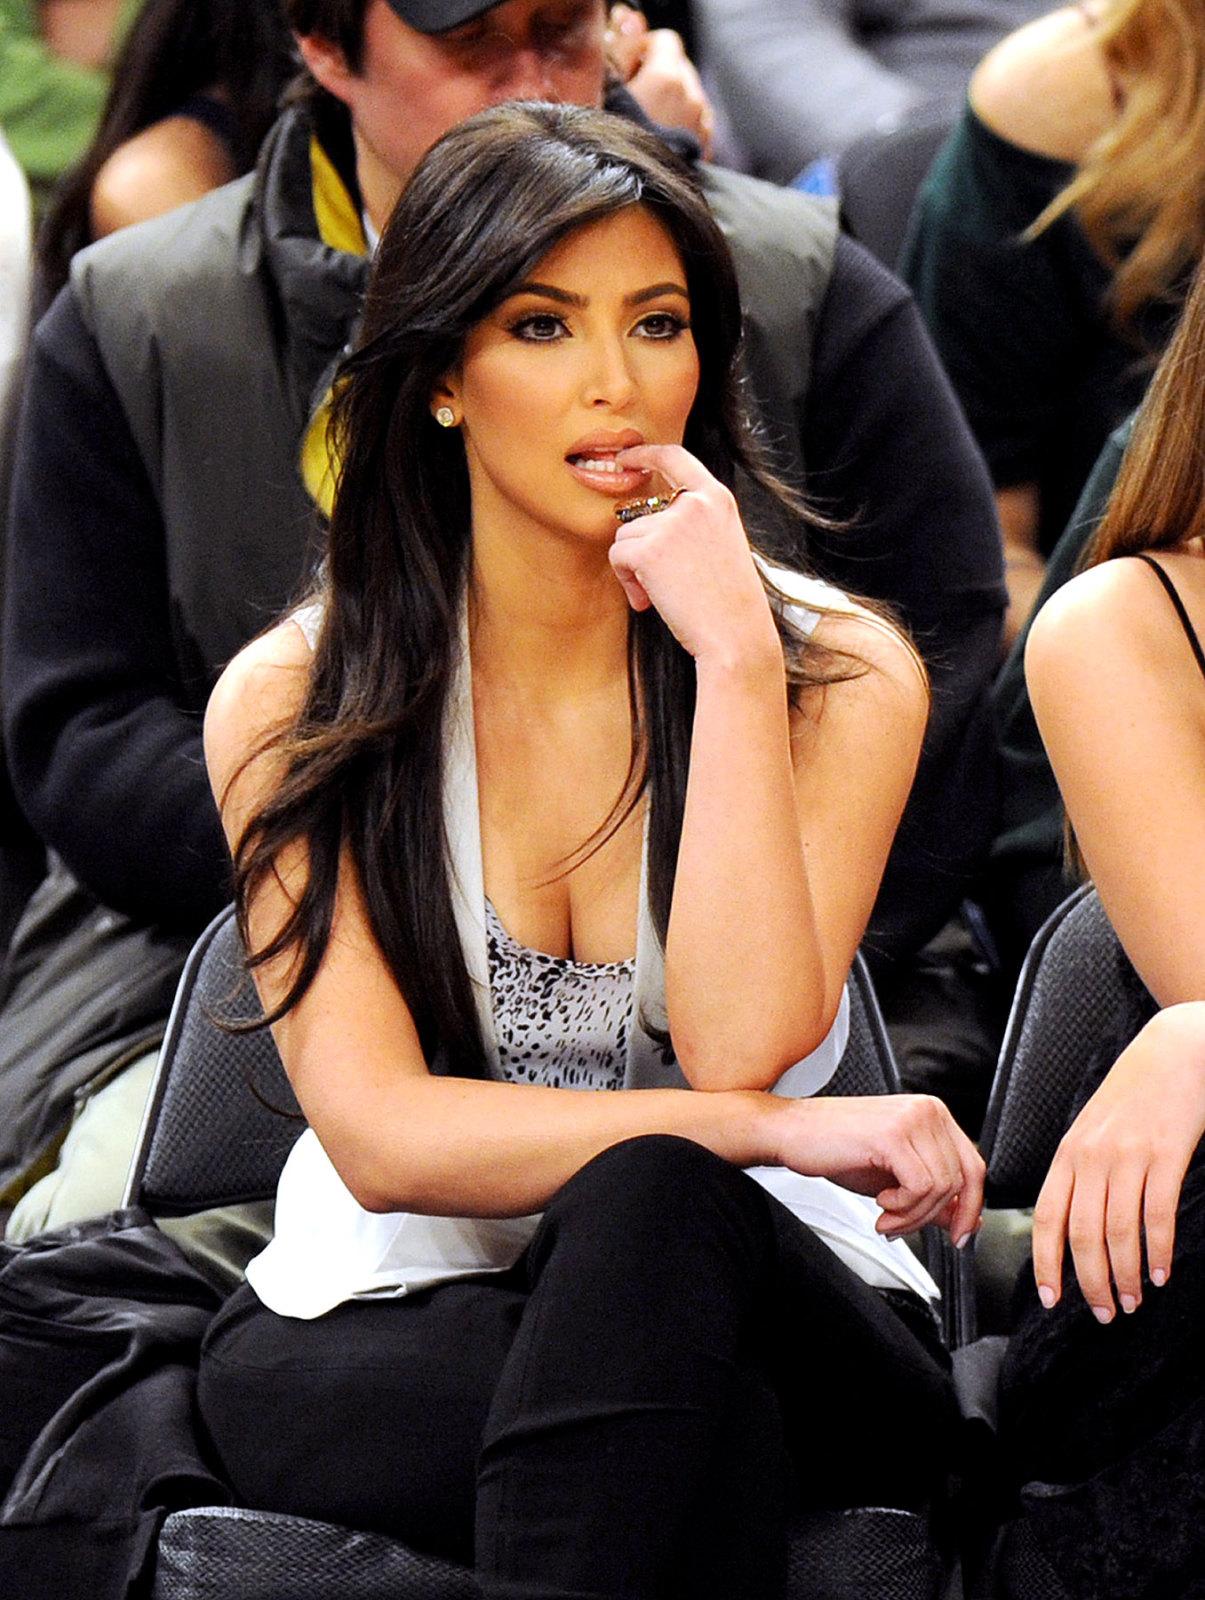 http://2.bp.blogspot.com/-SgYtC_wkfGY/T2jwDJEdM8I/AAAAAAAAAE8/5Jbud2-jqmI/s1600/kim-kardashian---.jpg